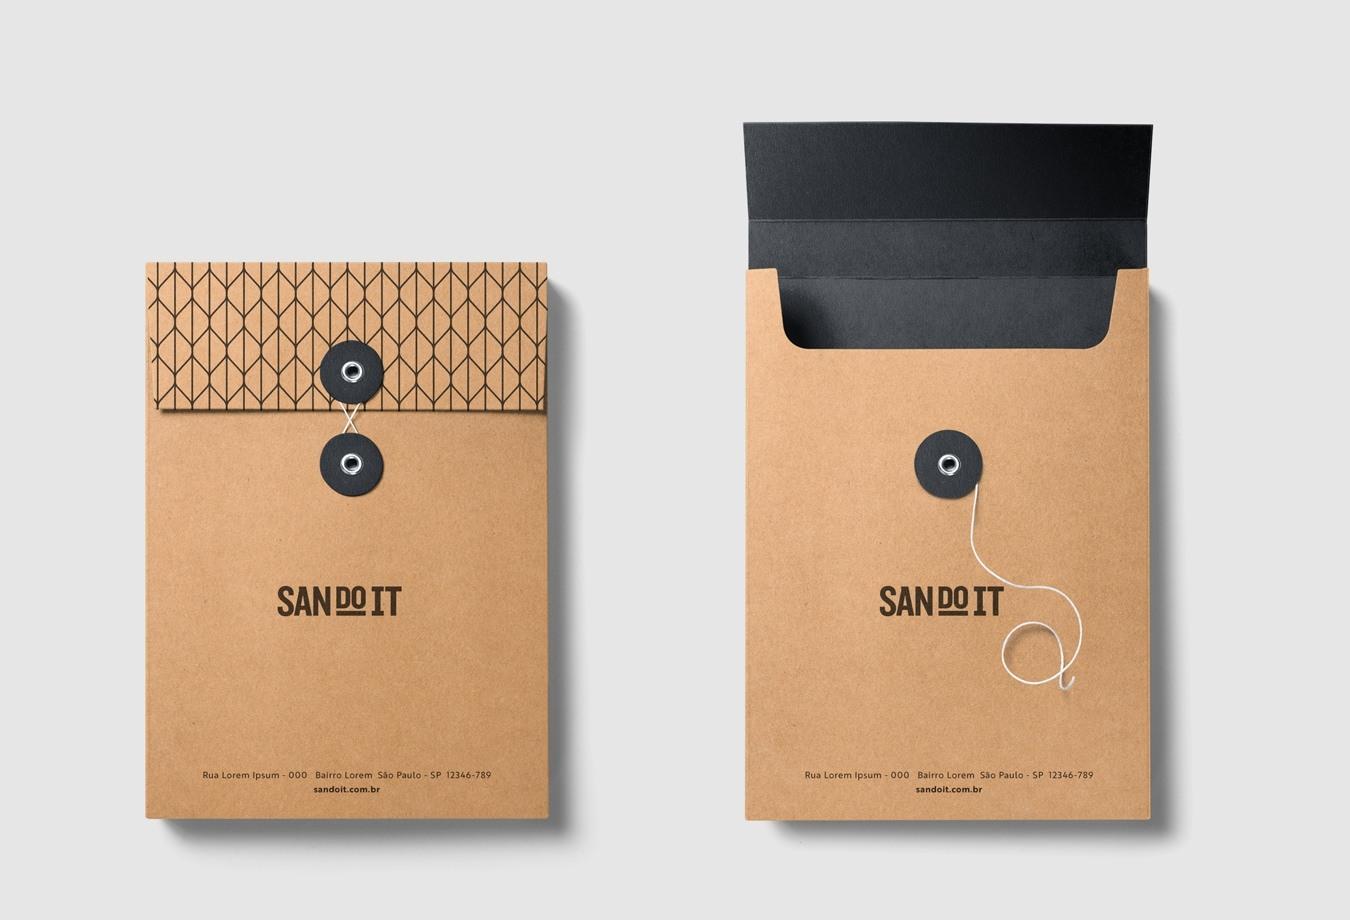 05-sandoit-visualidentity